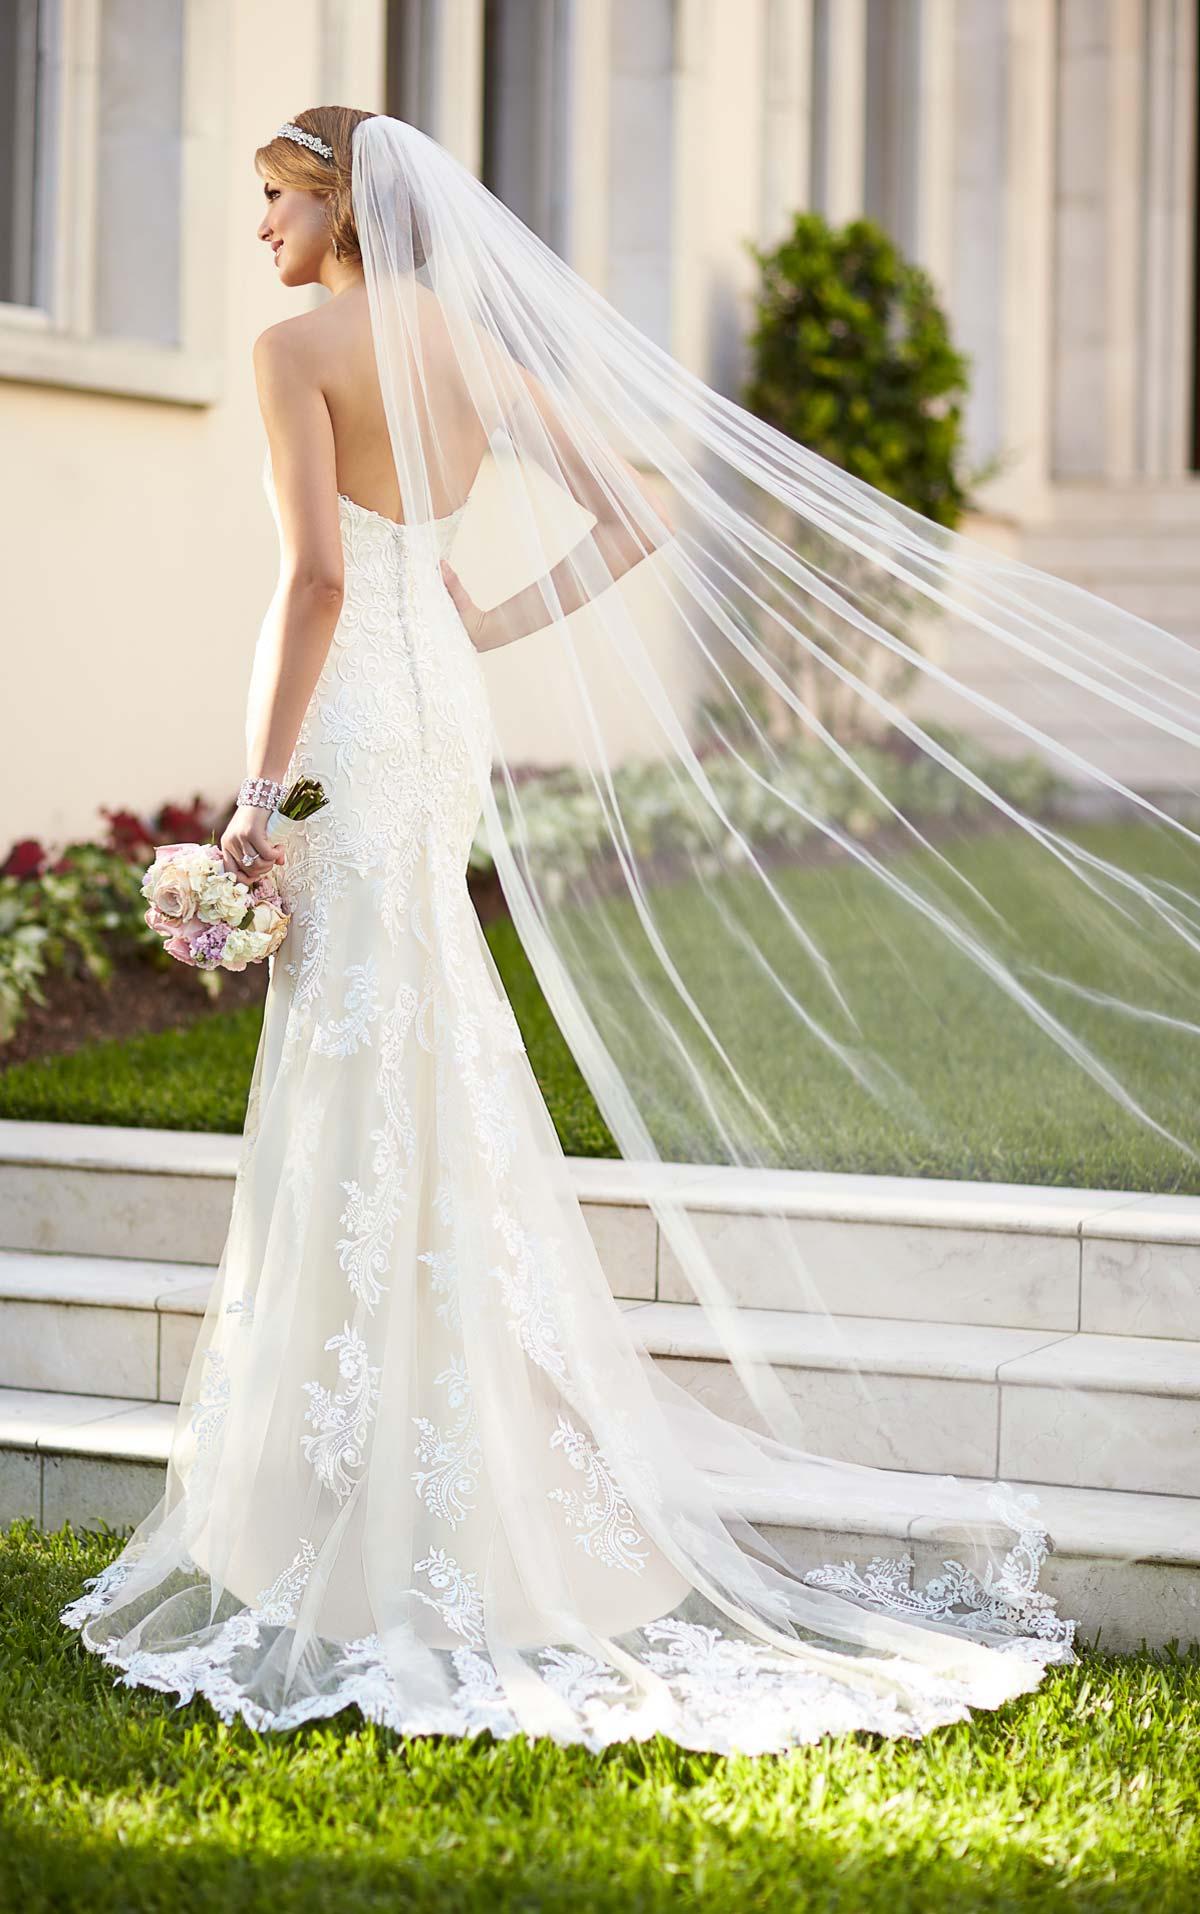 trunk shows wedding dresses photo - 1